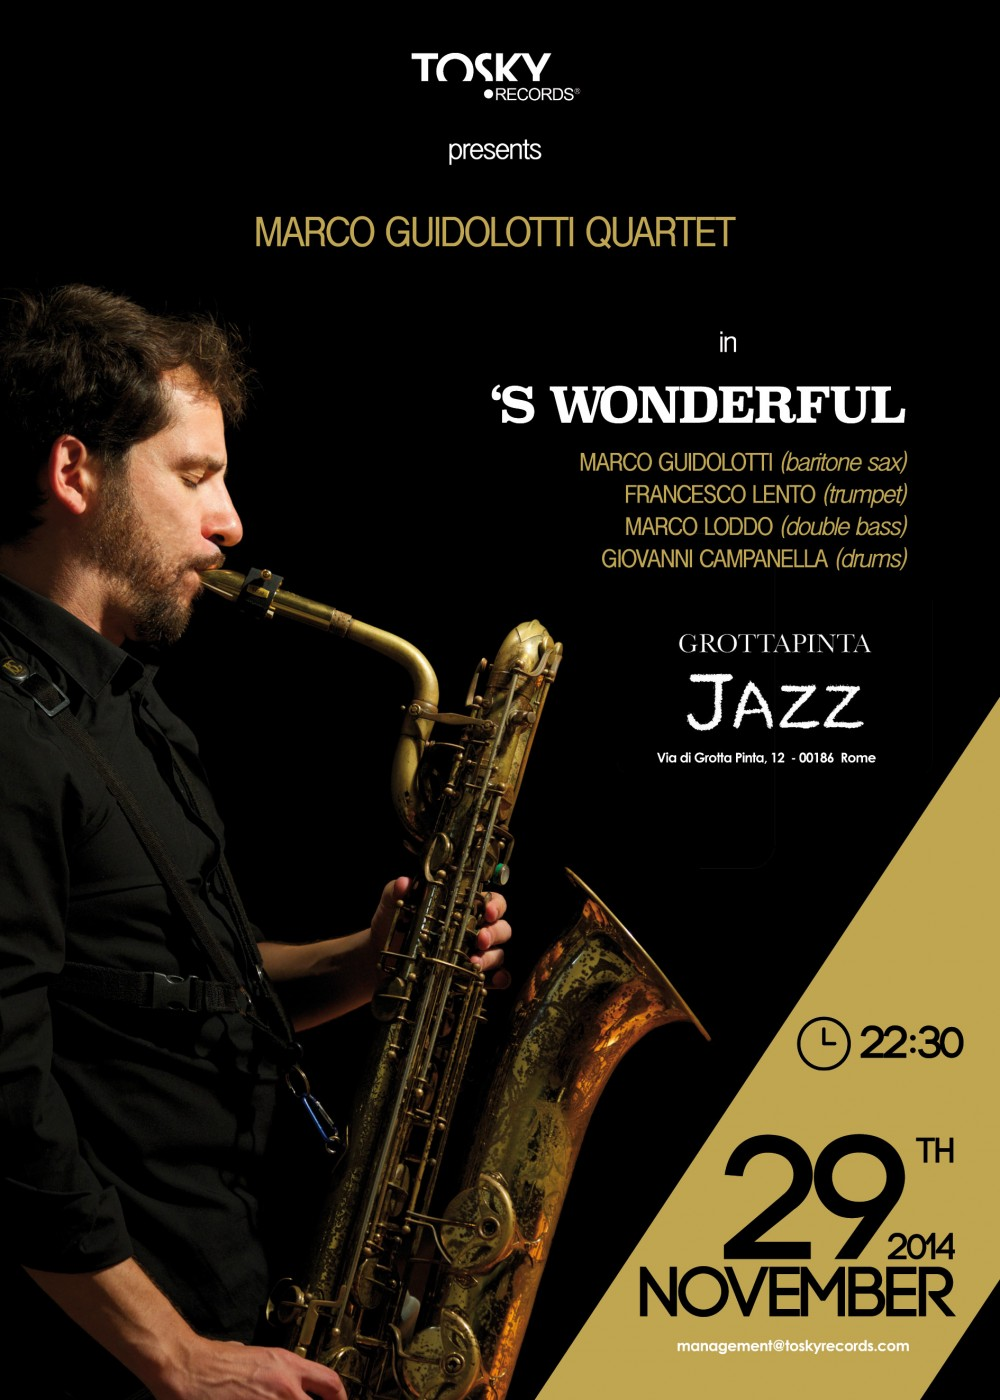 Locandina_29Novembre_Marco Guidolotti Quartet_GrottaPinta